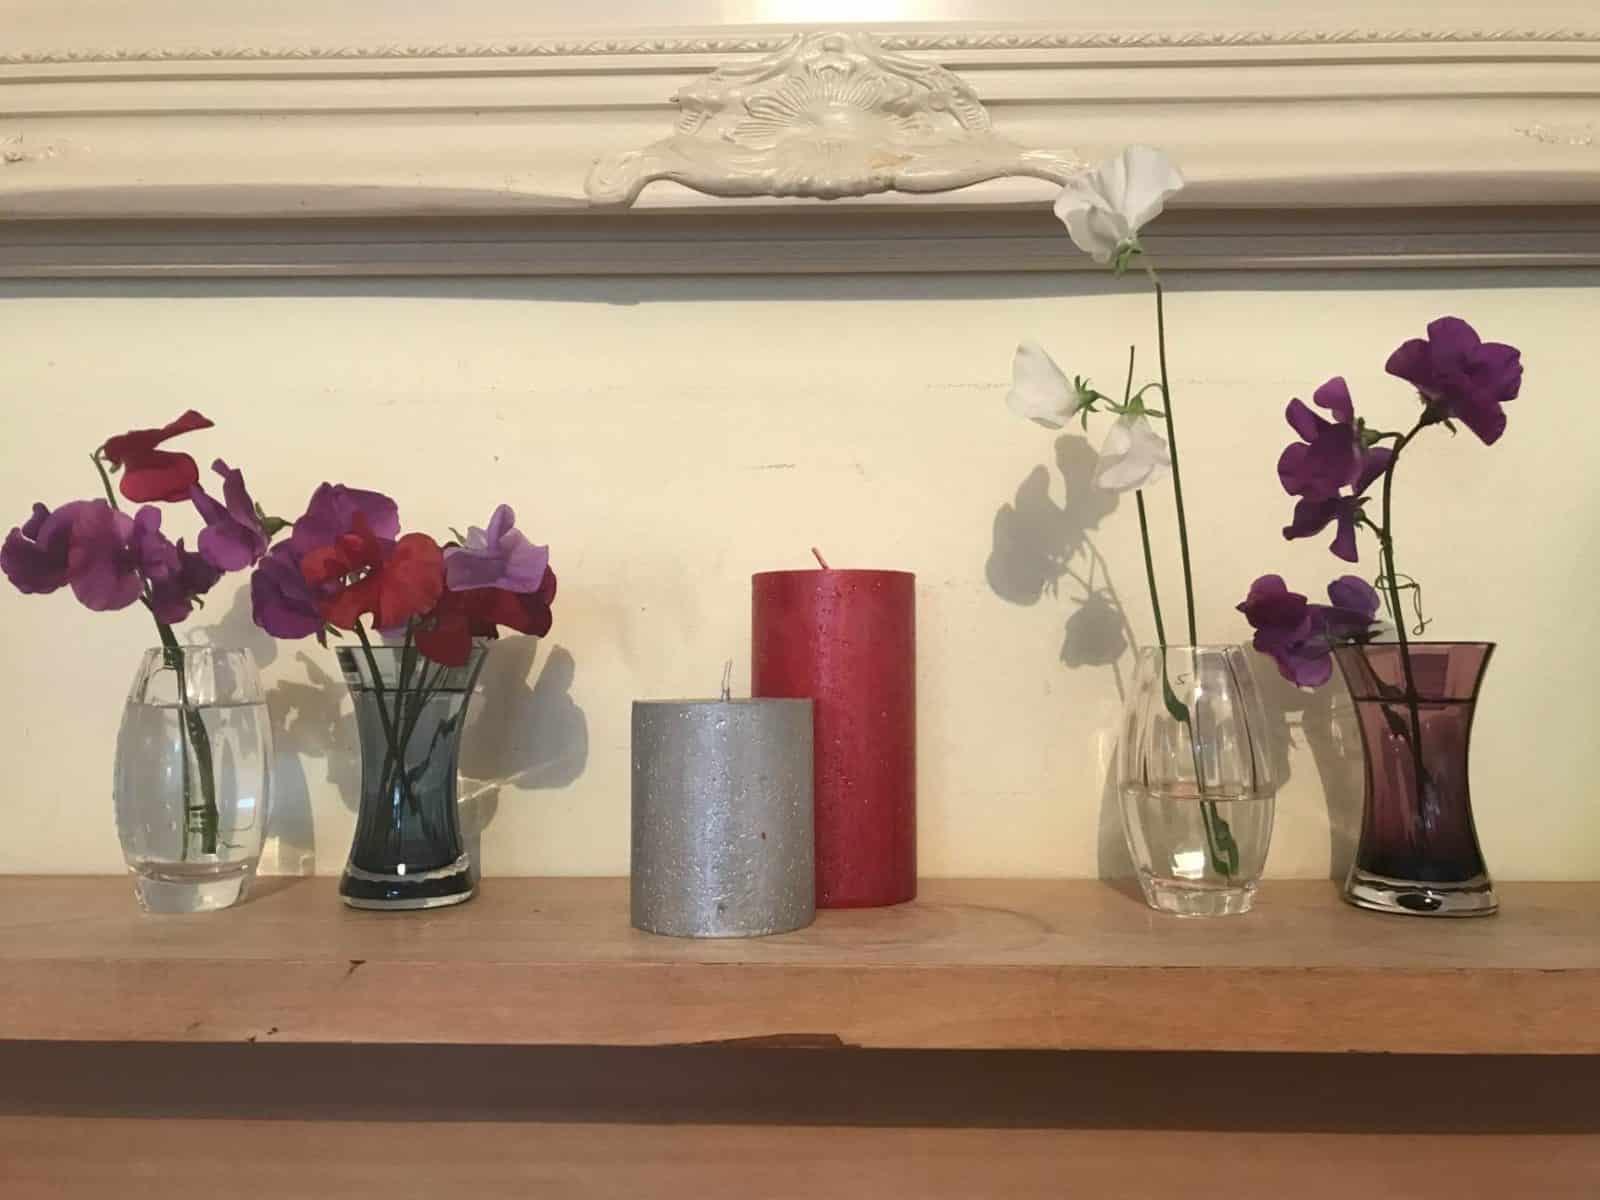 The perfect sweetpea vase